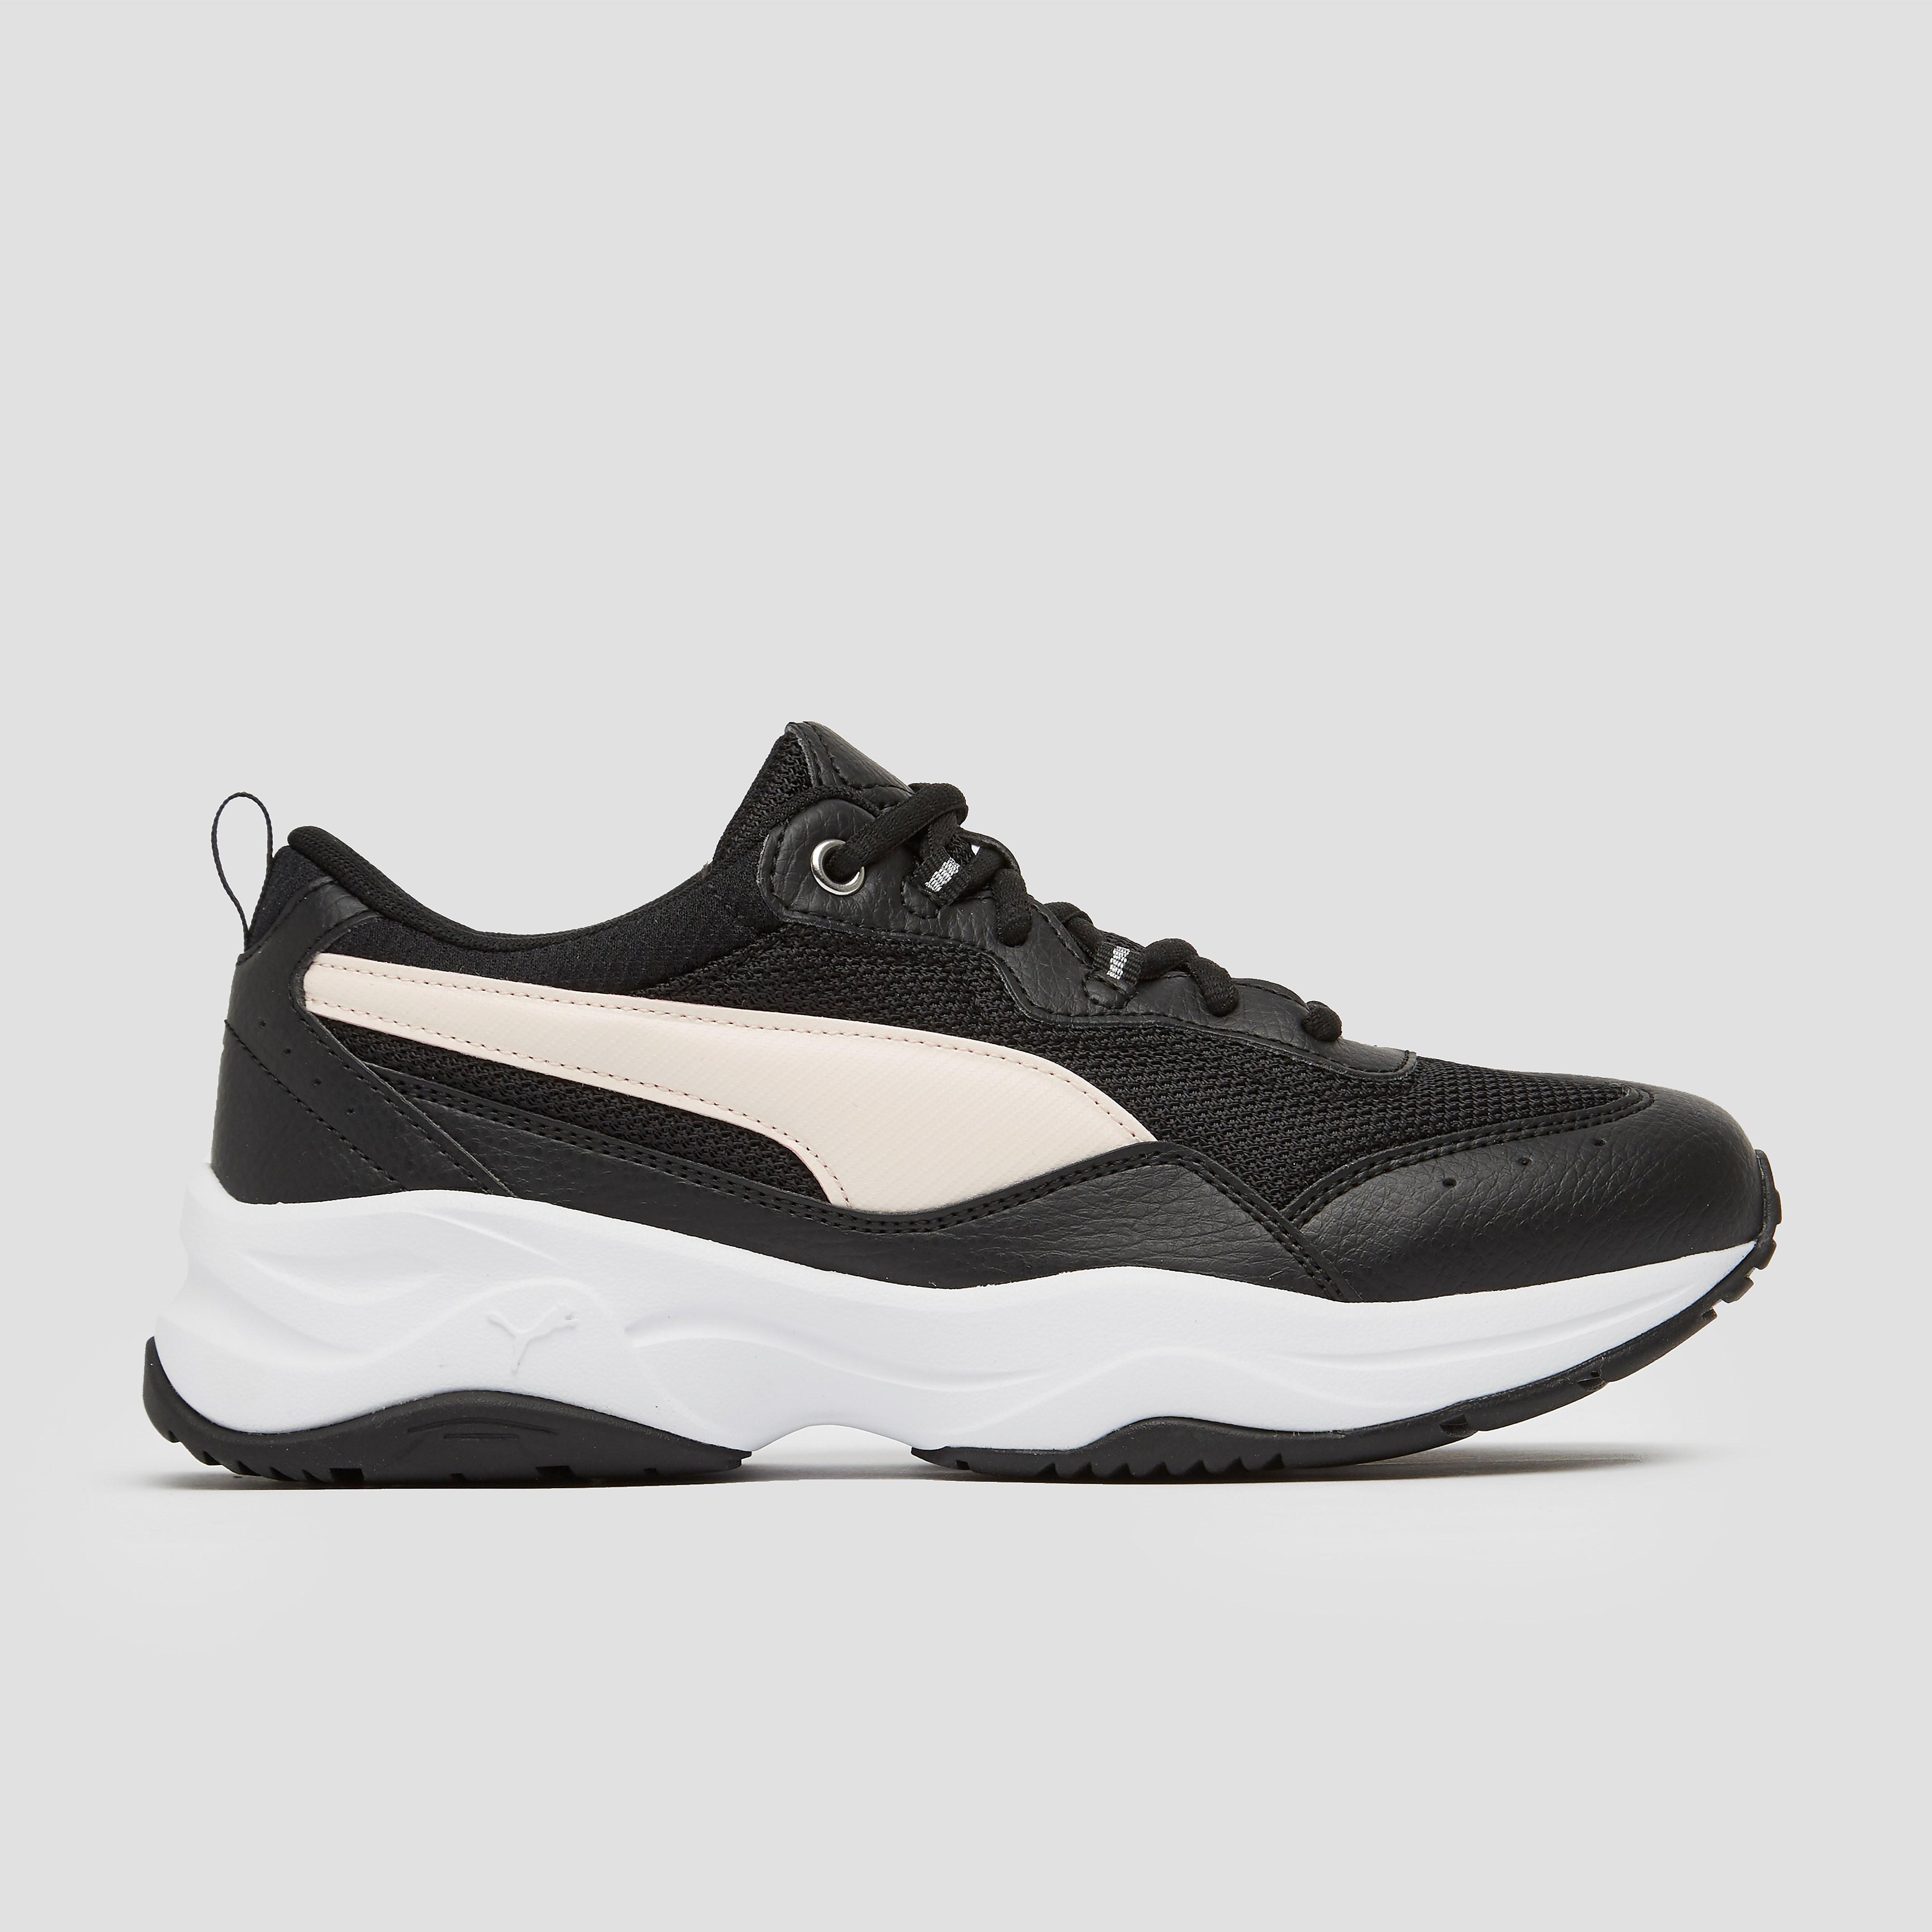 PUMA Cilia sneakers zwart/roze dames online kopen